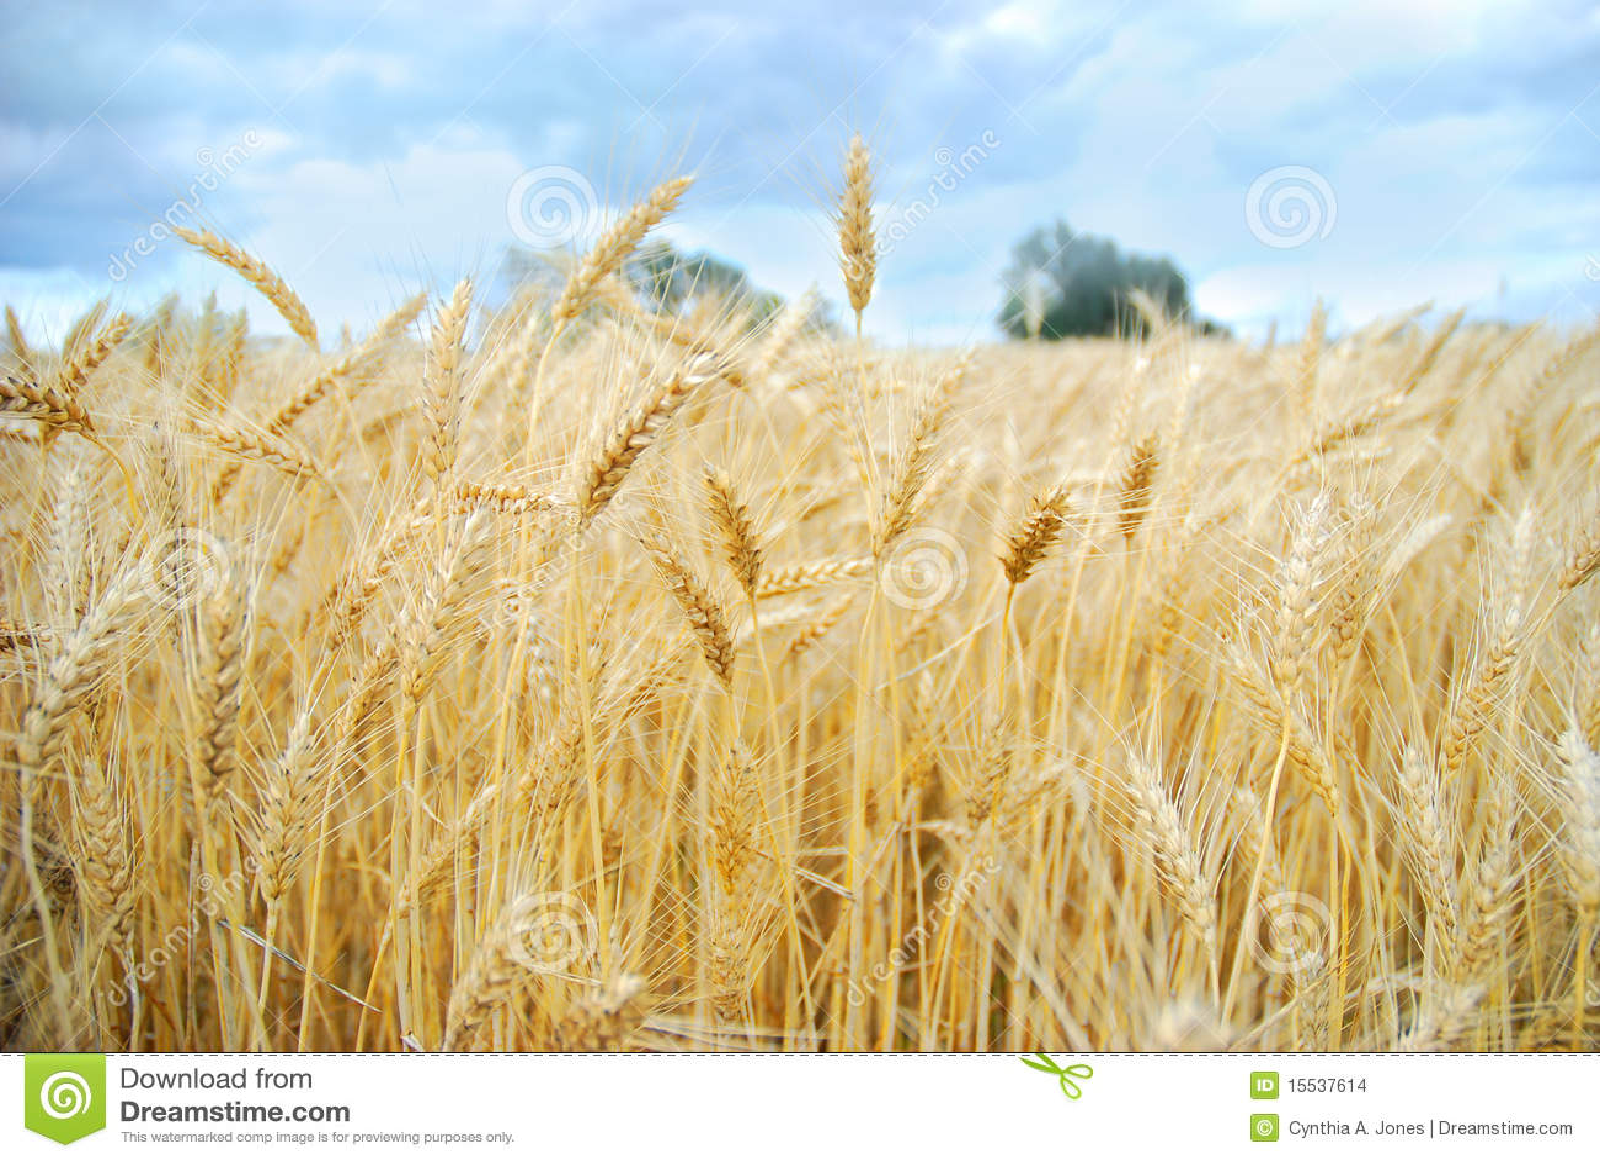 Weizen-Feld-Ernte